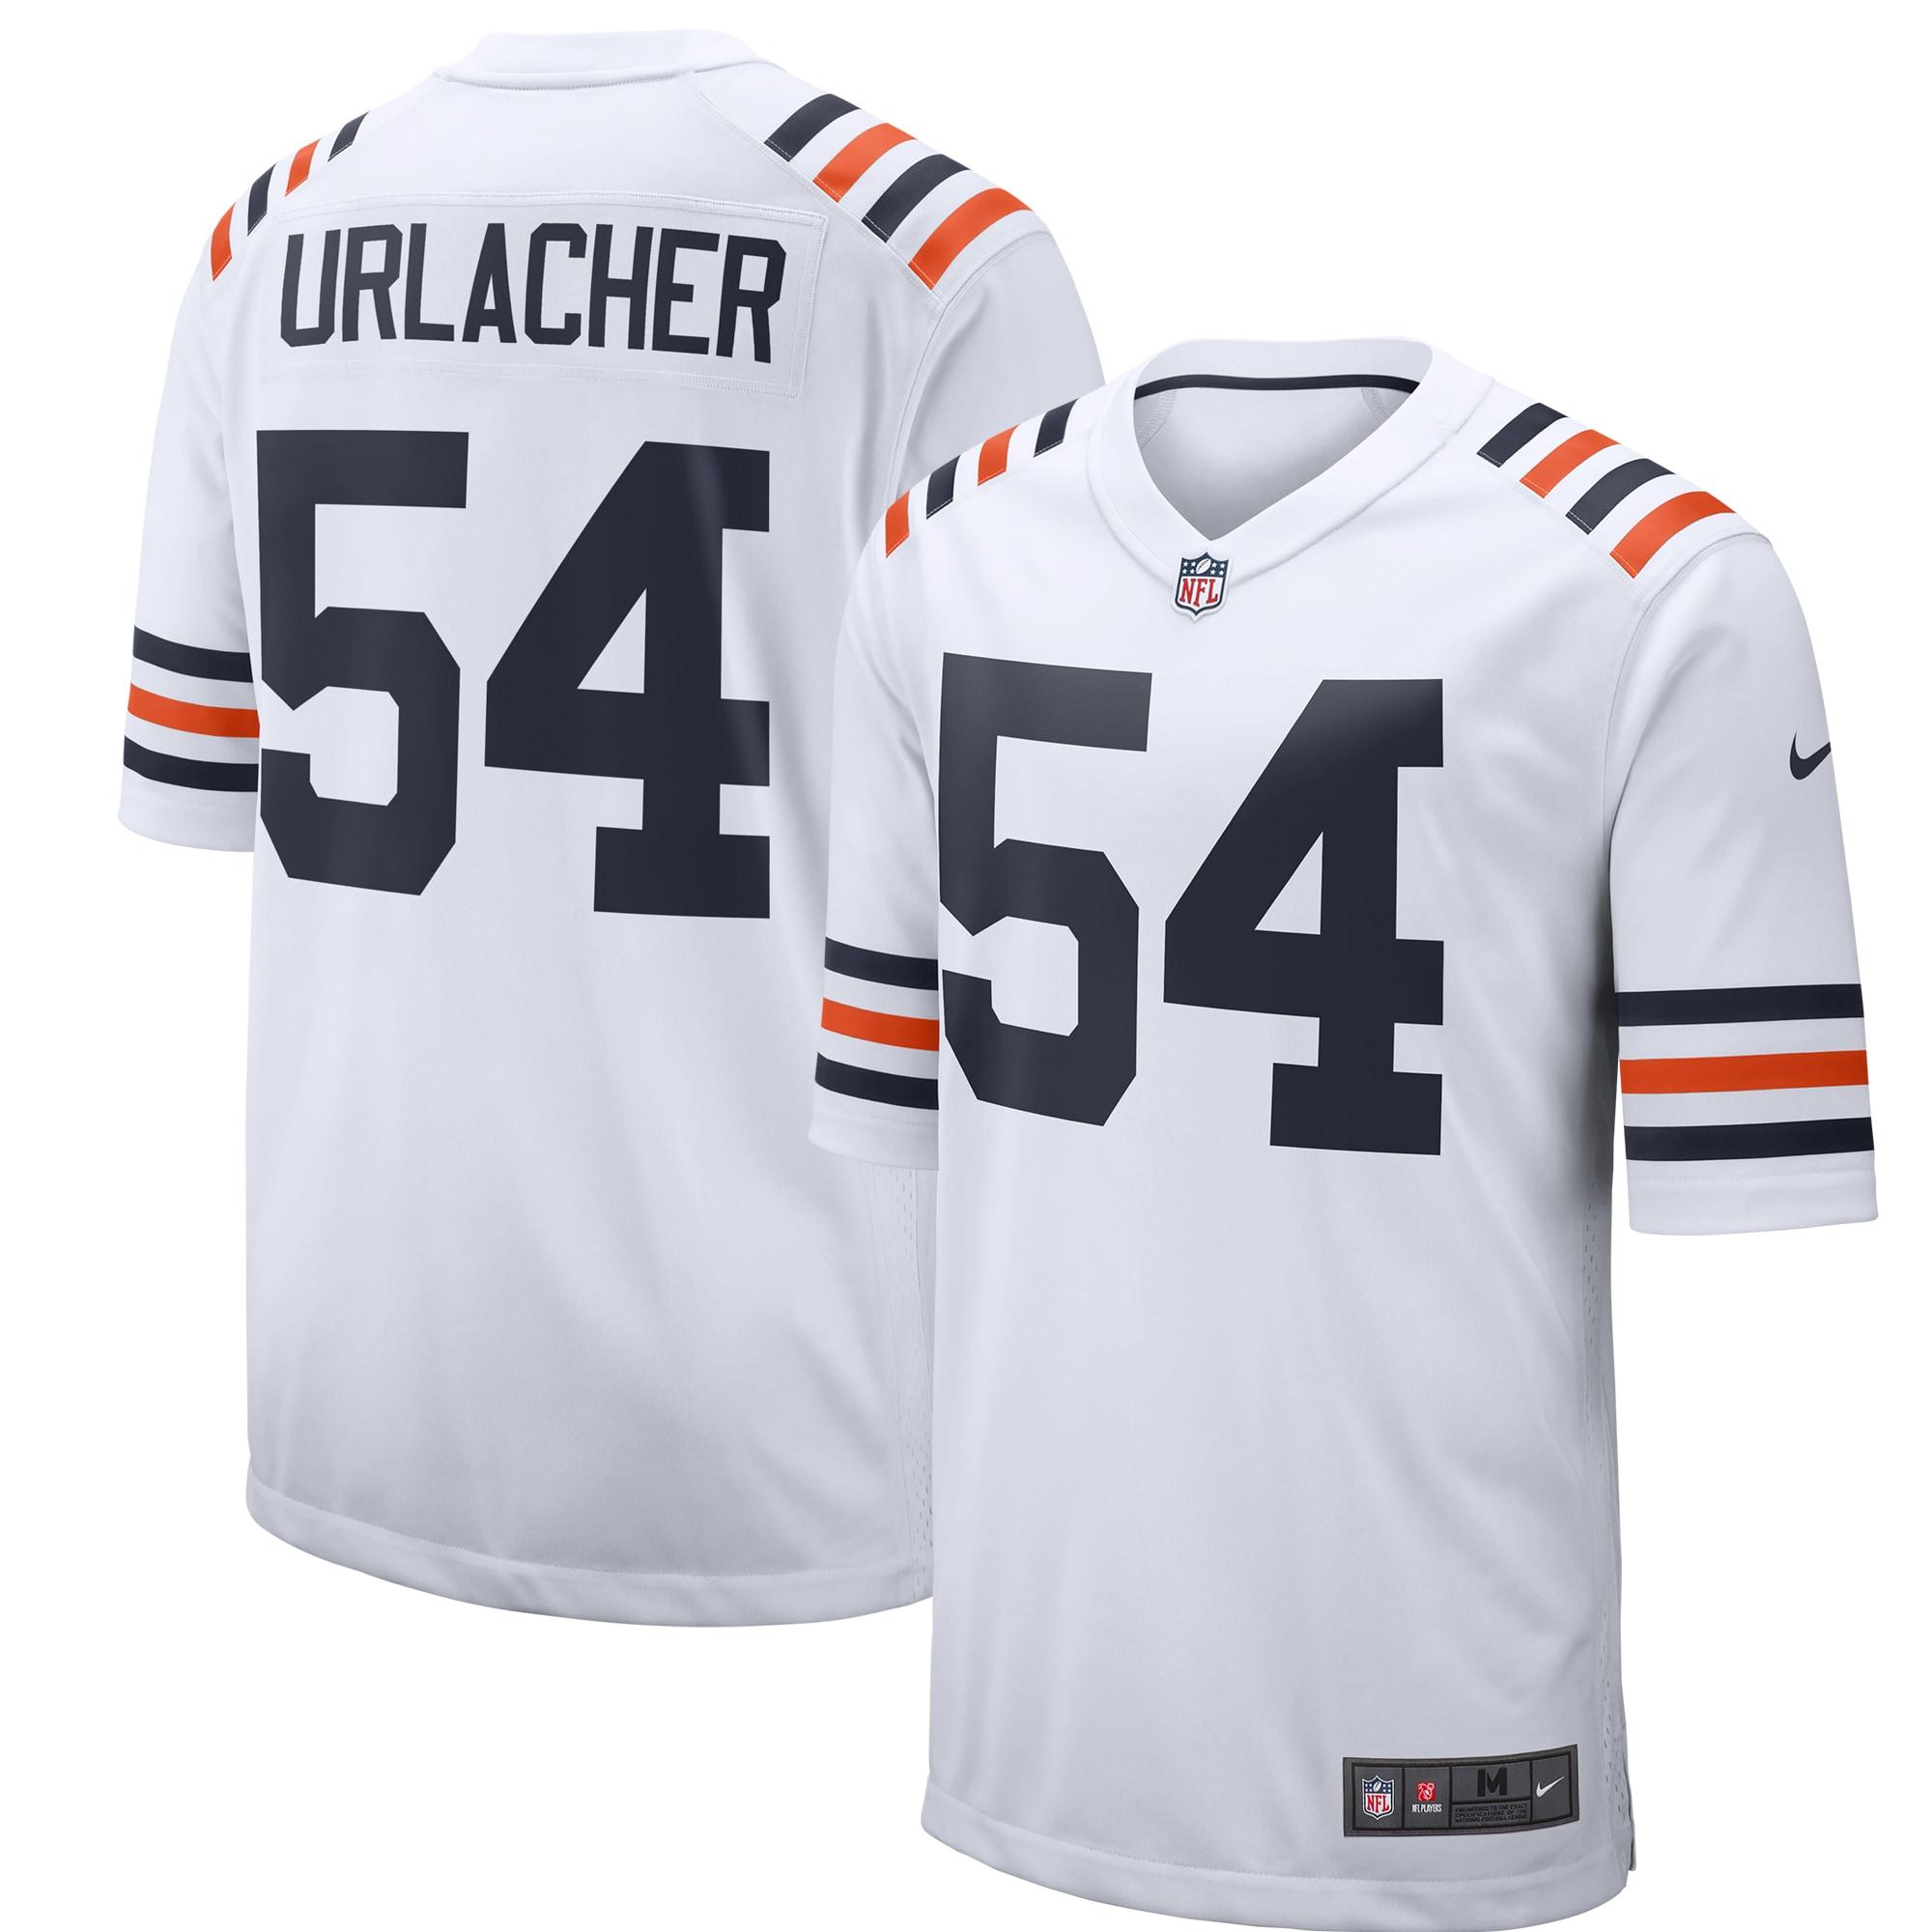 Brian Urlacher Chicago Bears Nike 2019 Alternate Classic Retired Player Game Jersey - White